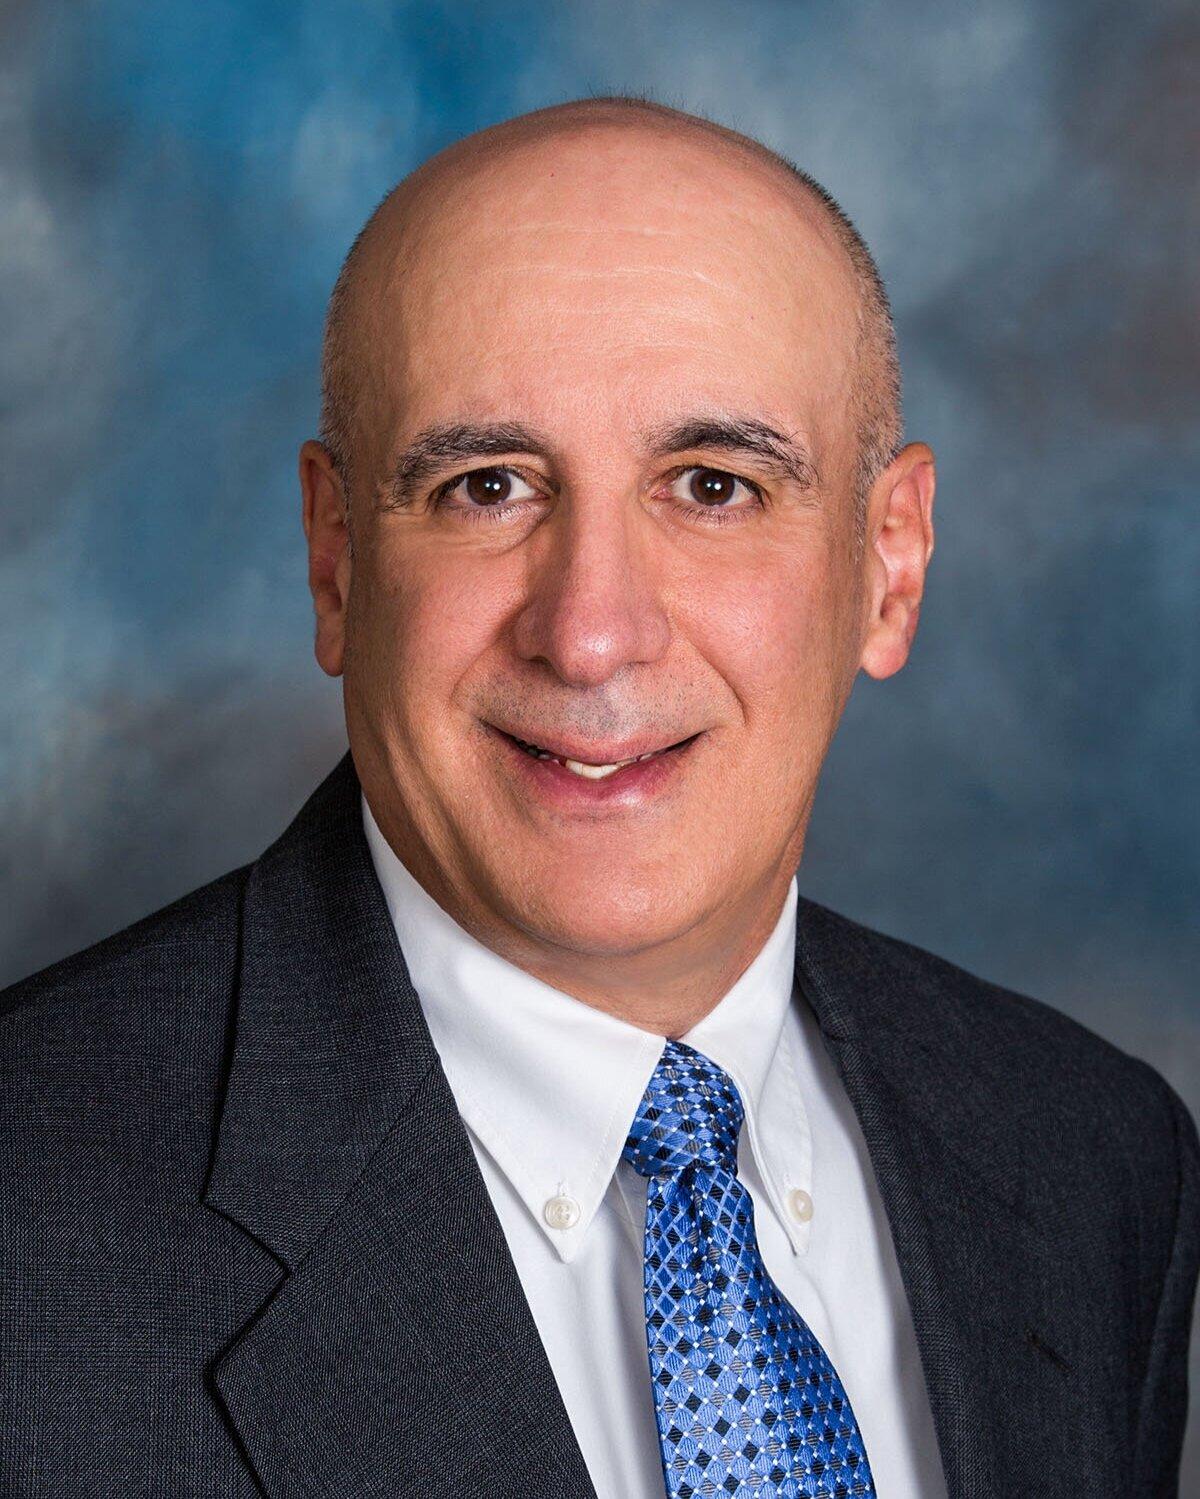 Engineer of the YearGregory A.Porpora, CISSP - Distinguished EngineerAdvanced Analytics, Cybersecurity & IntelligenceIBM Corporation